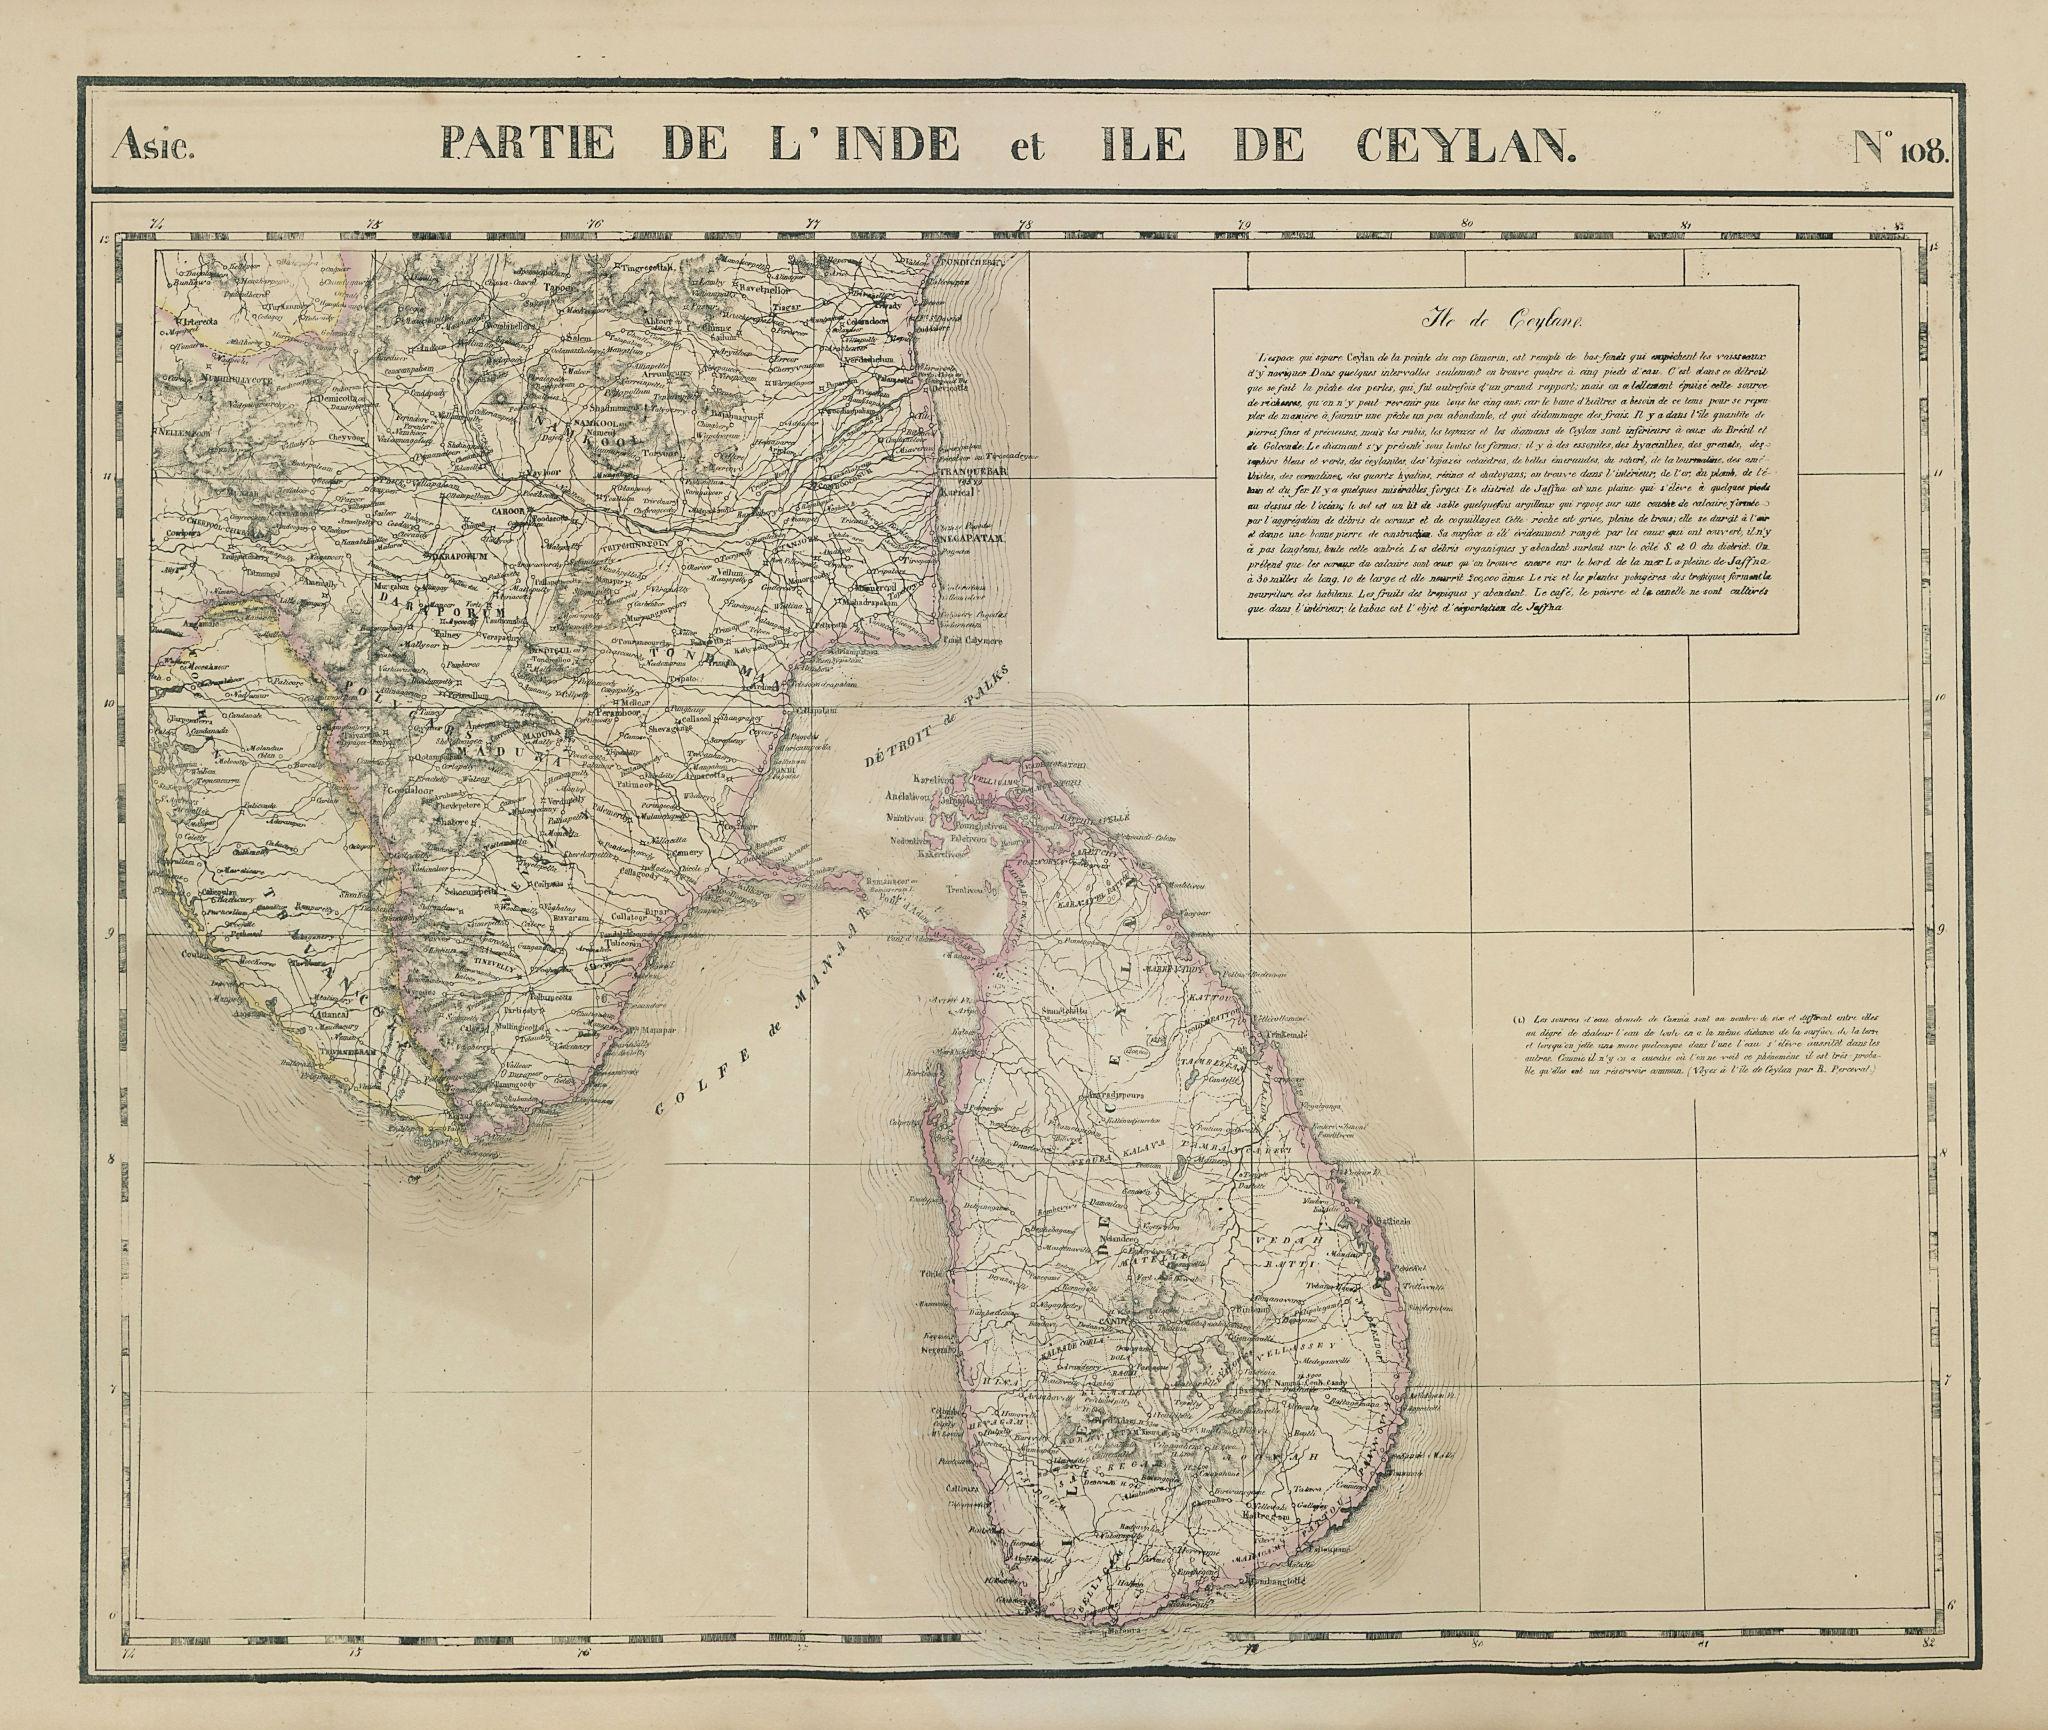 Asie. Inde & Ceylan #108 India Sri Lanka Kerala Tamil Nadu VANDERMAELEN 1827 map